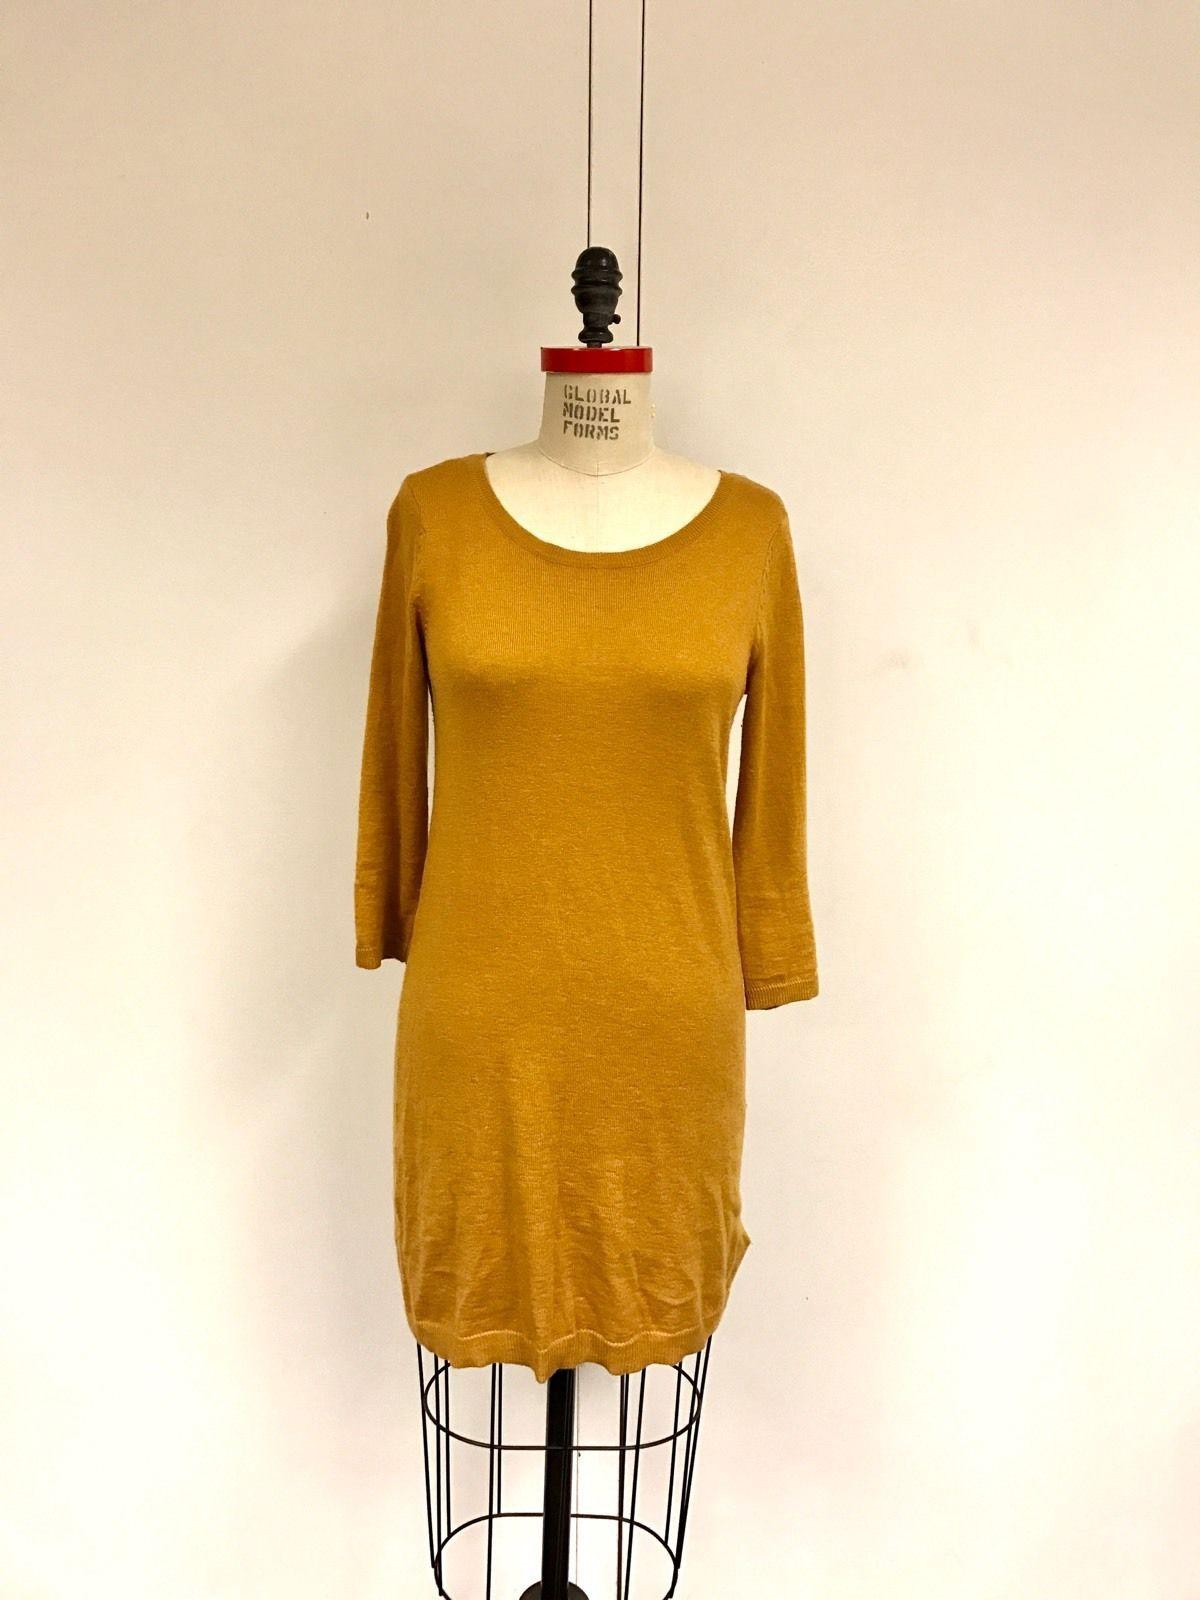 Burnt orange dress plus size  Awesome Amazing HuM Womens S Mustard Yellow Long Sleeve Sweater